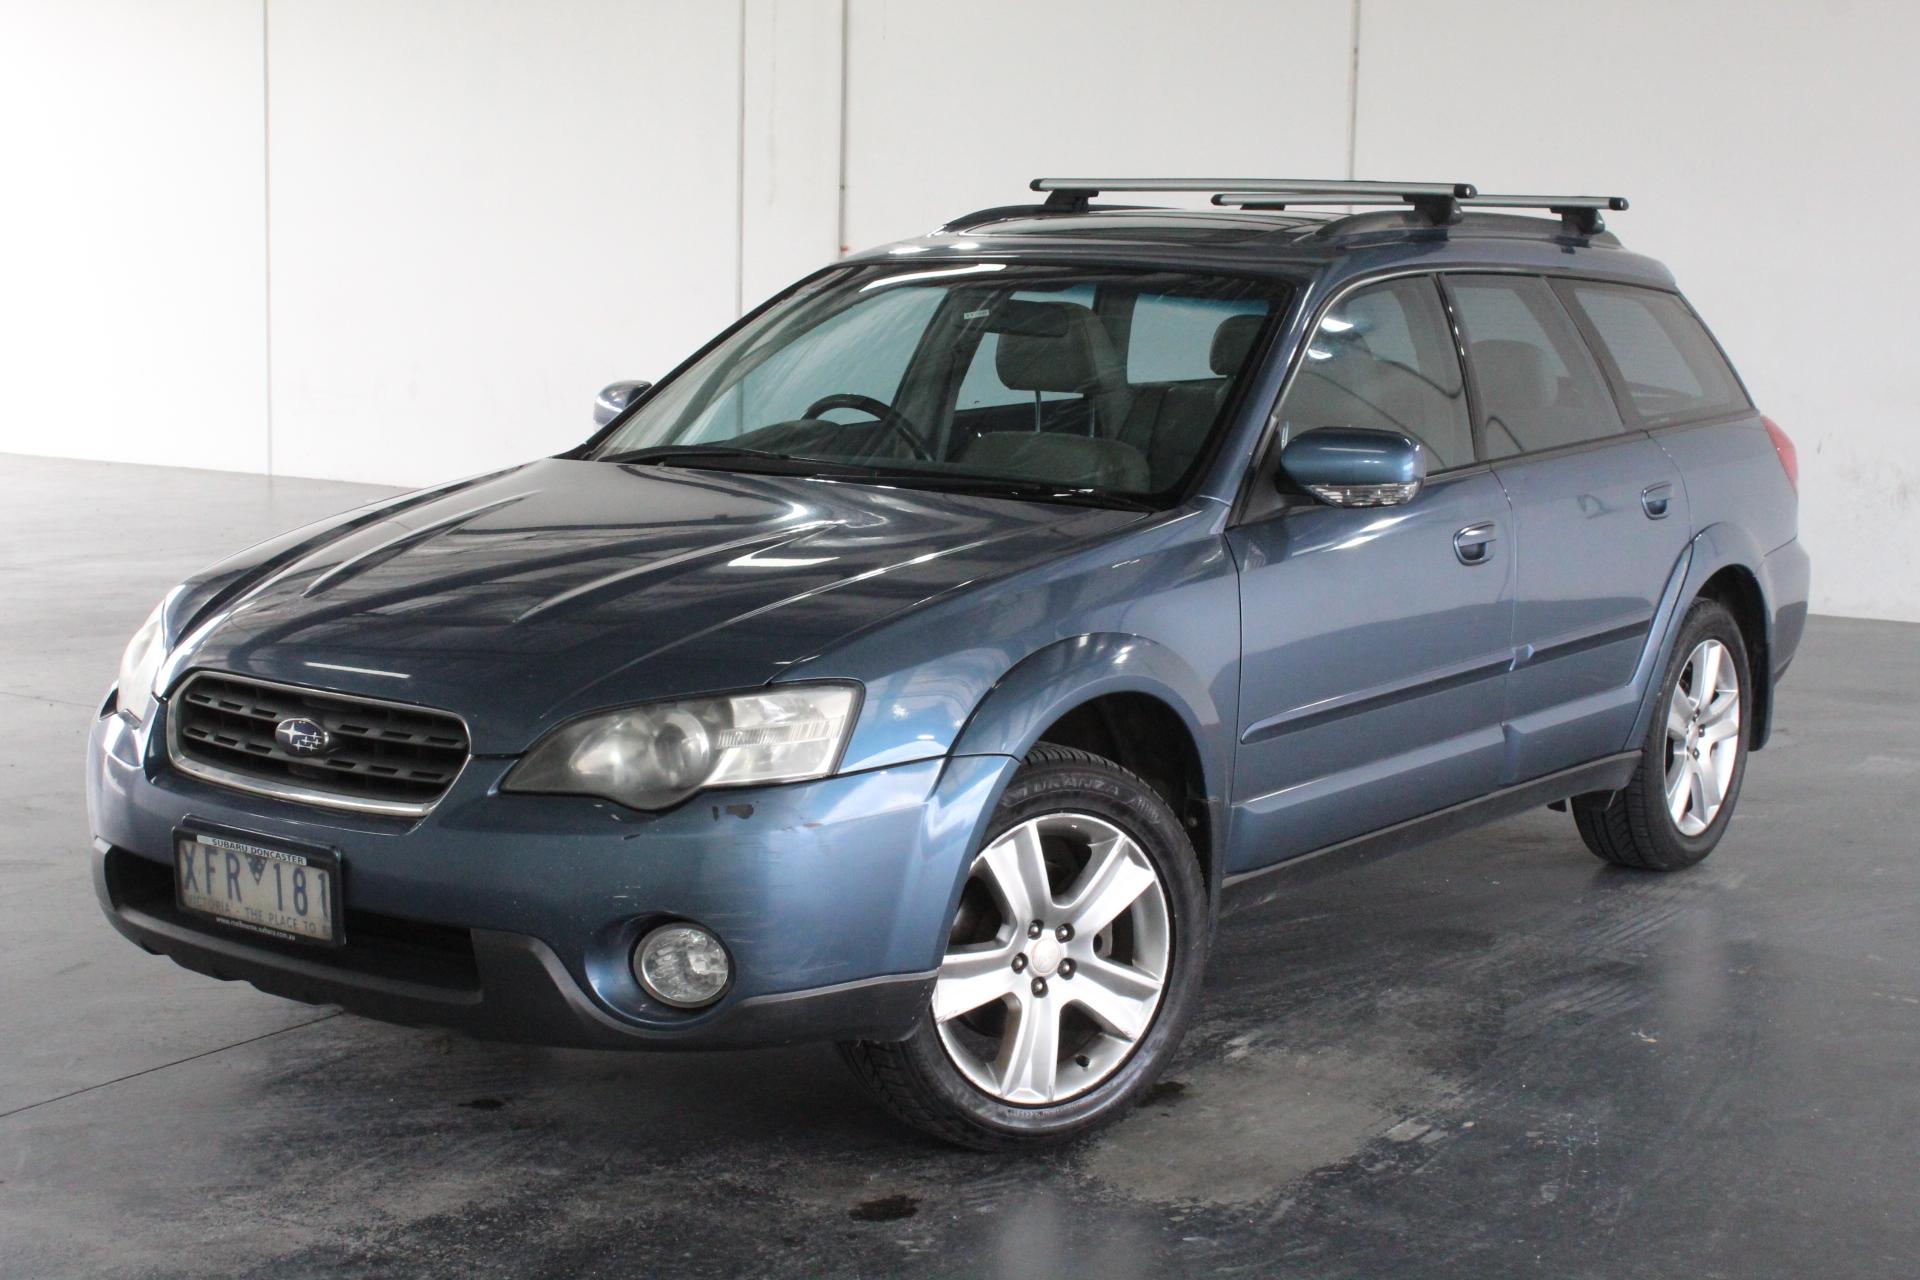 2006 Subaru Outback 3.0R Premium B4A Automatic Wagon